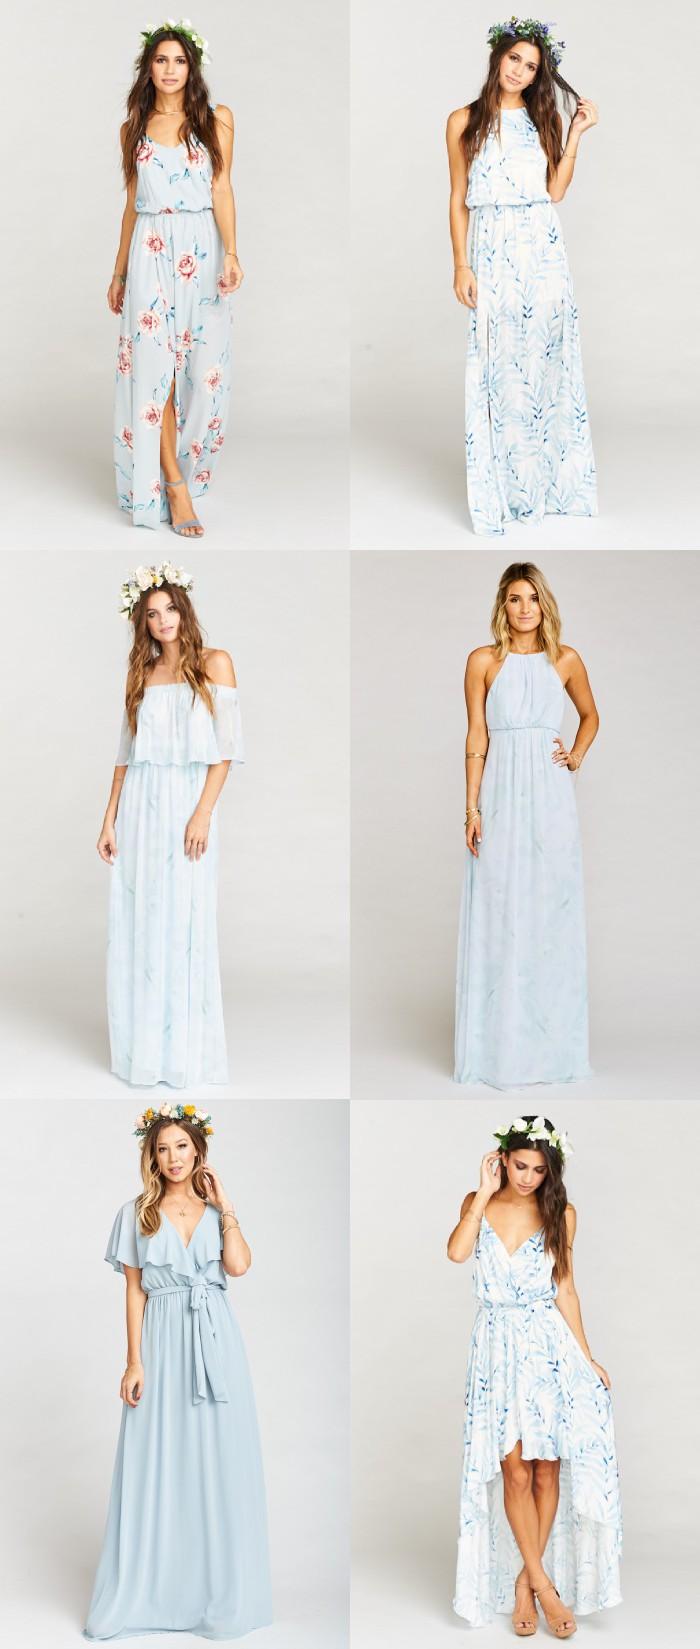 Mismatched Dresses in Light Blue Modern Bridesmaid Dresses